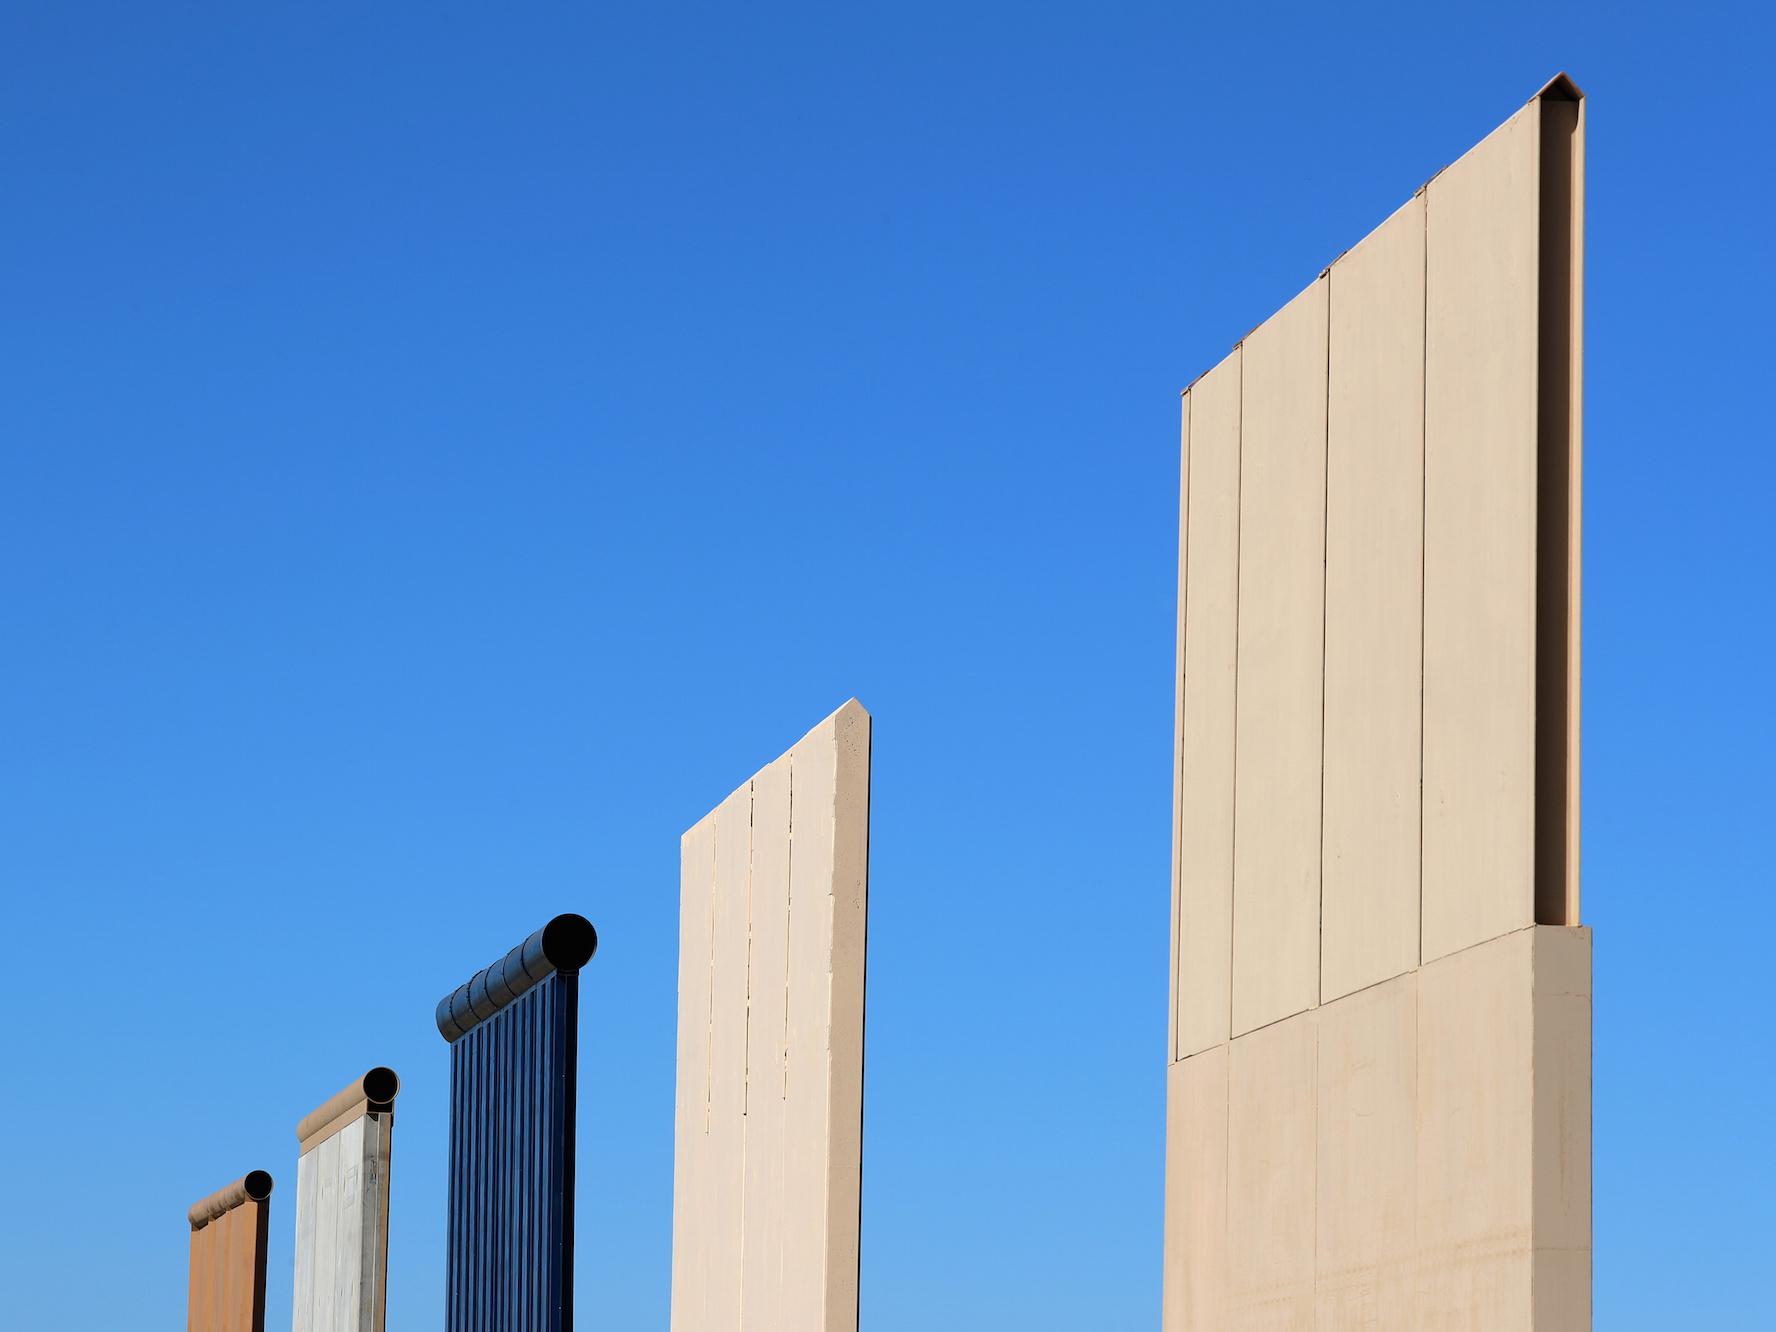 171027-border-wall-prototypes-ew-315p_a4f6e0a8cb960afecce73b663803b85a.jpg